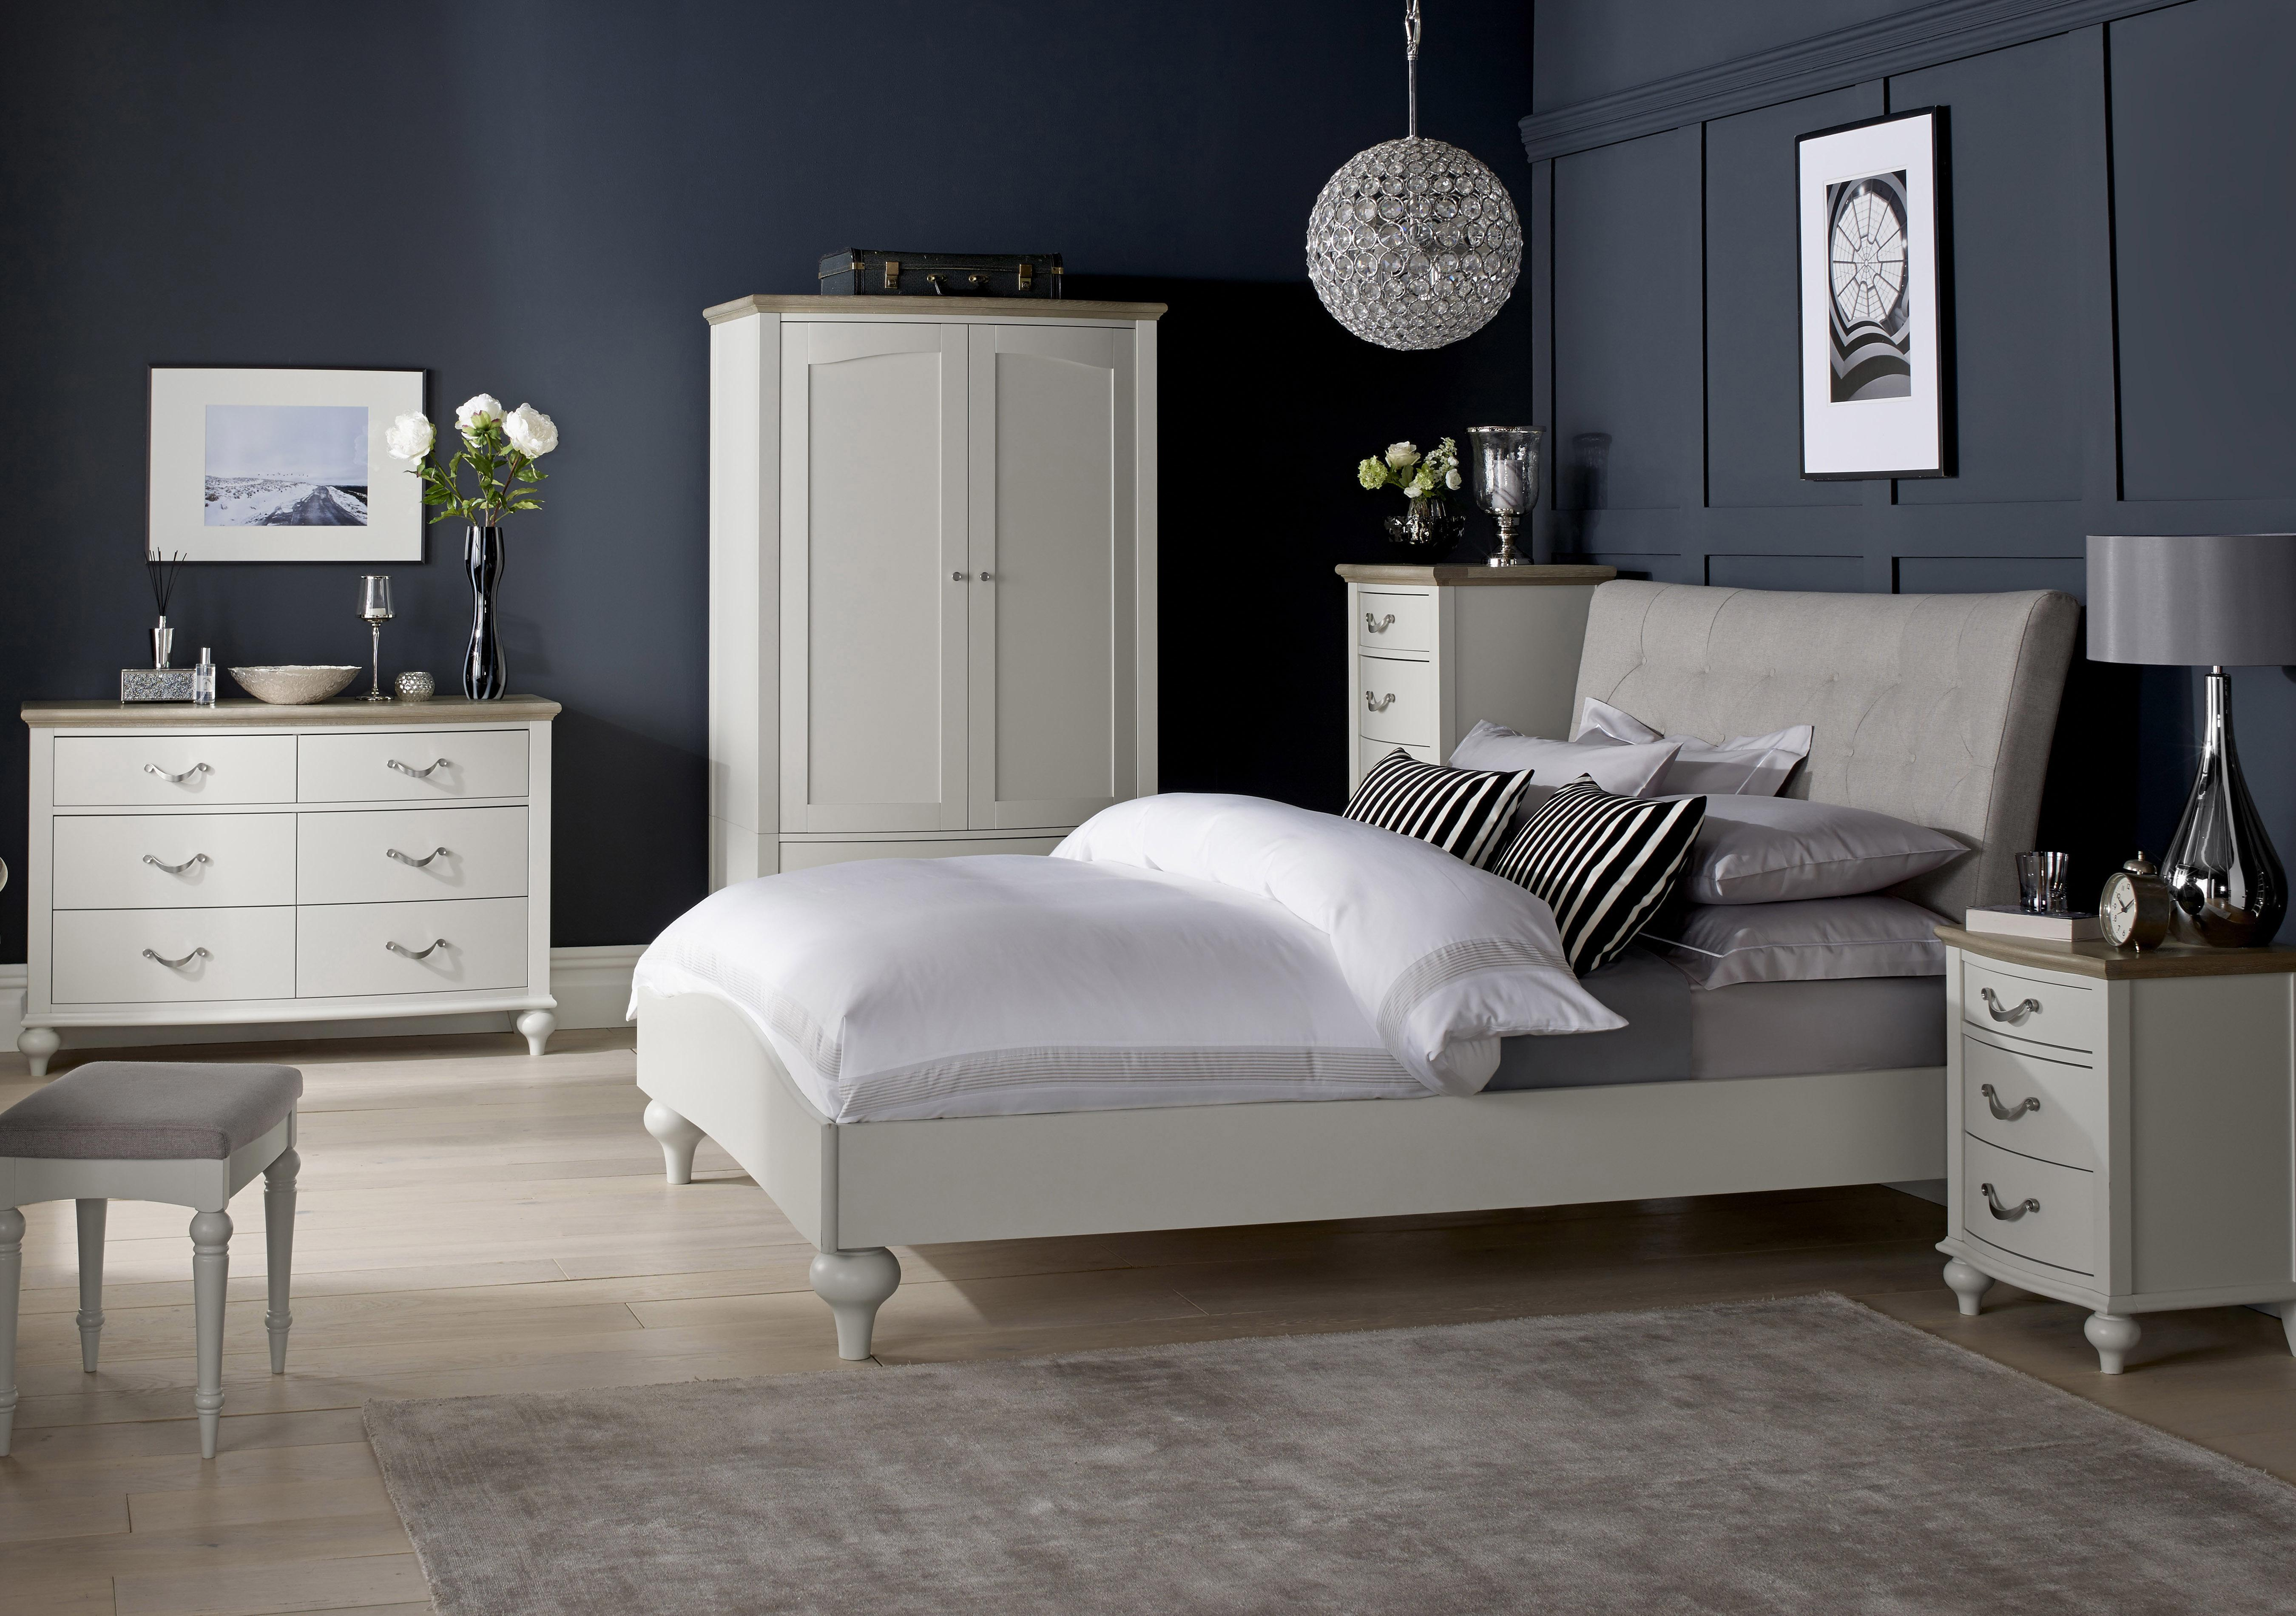 Picture of: 7 Inspirational Master Bedroom Ideas At Furniture Village Furniture Village